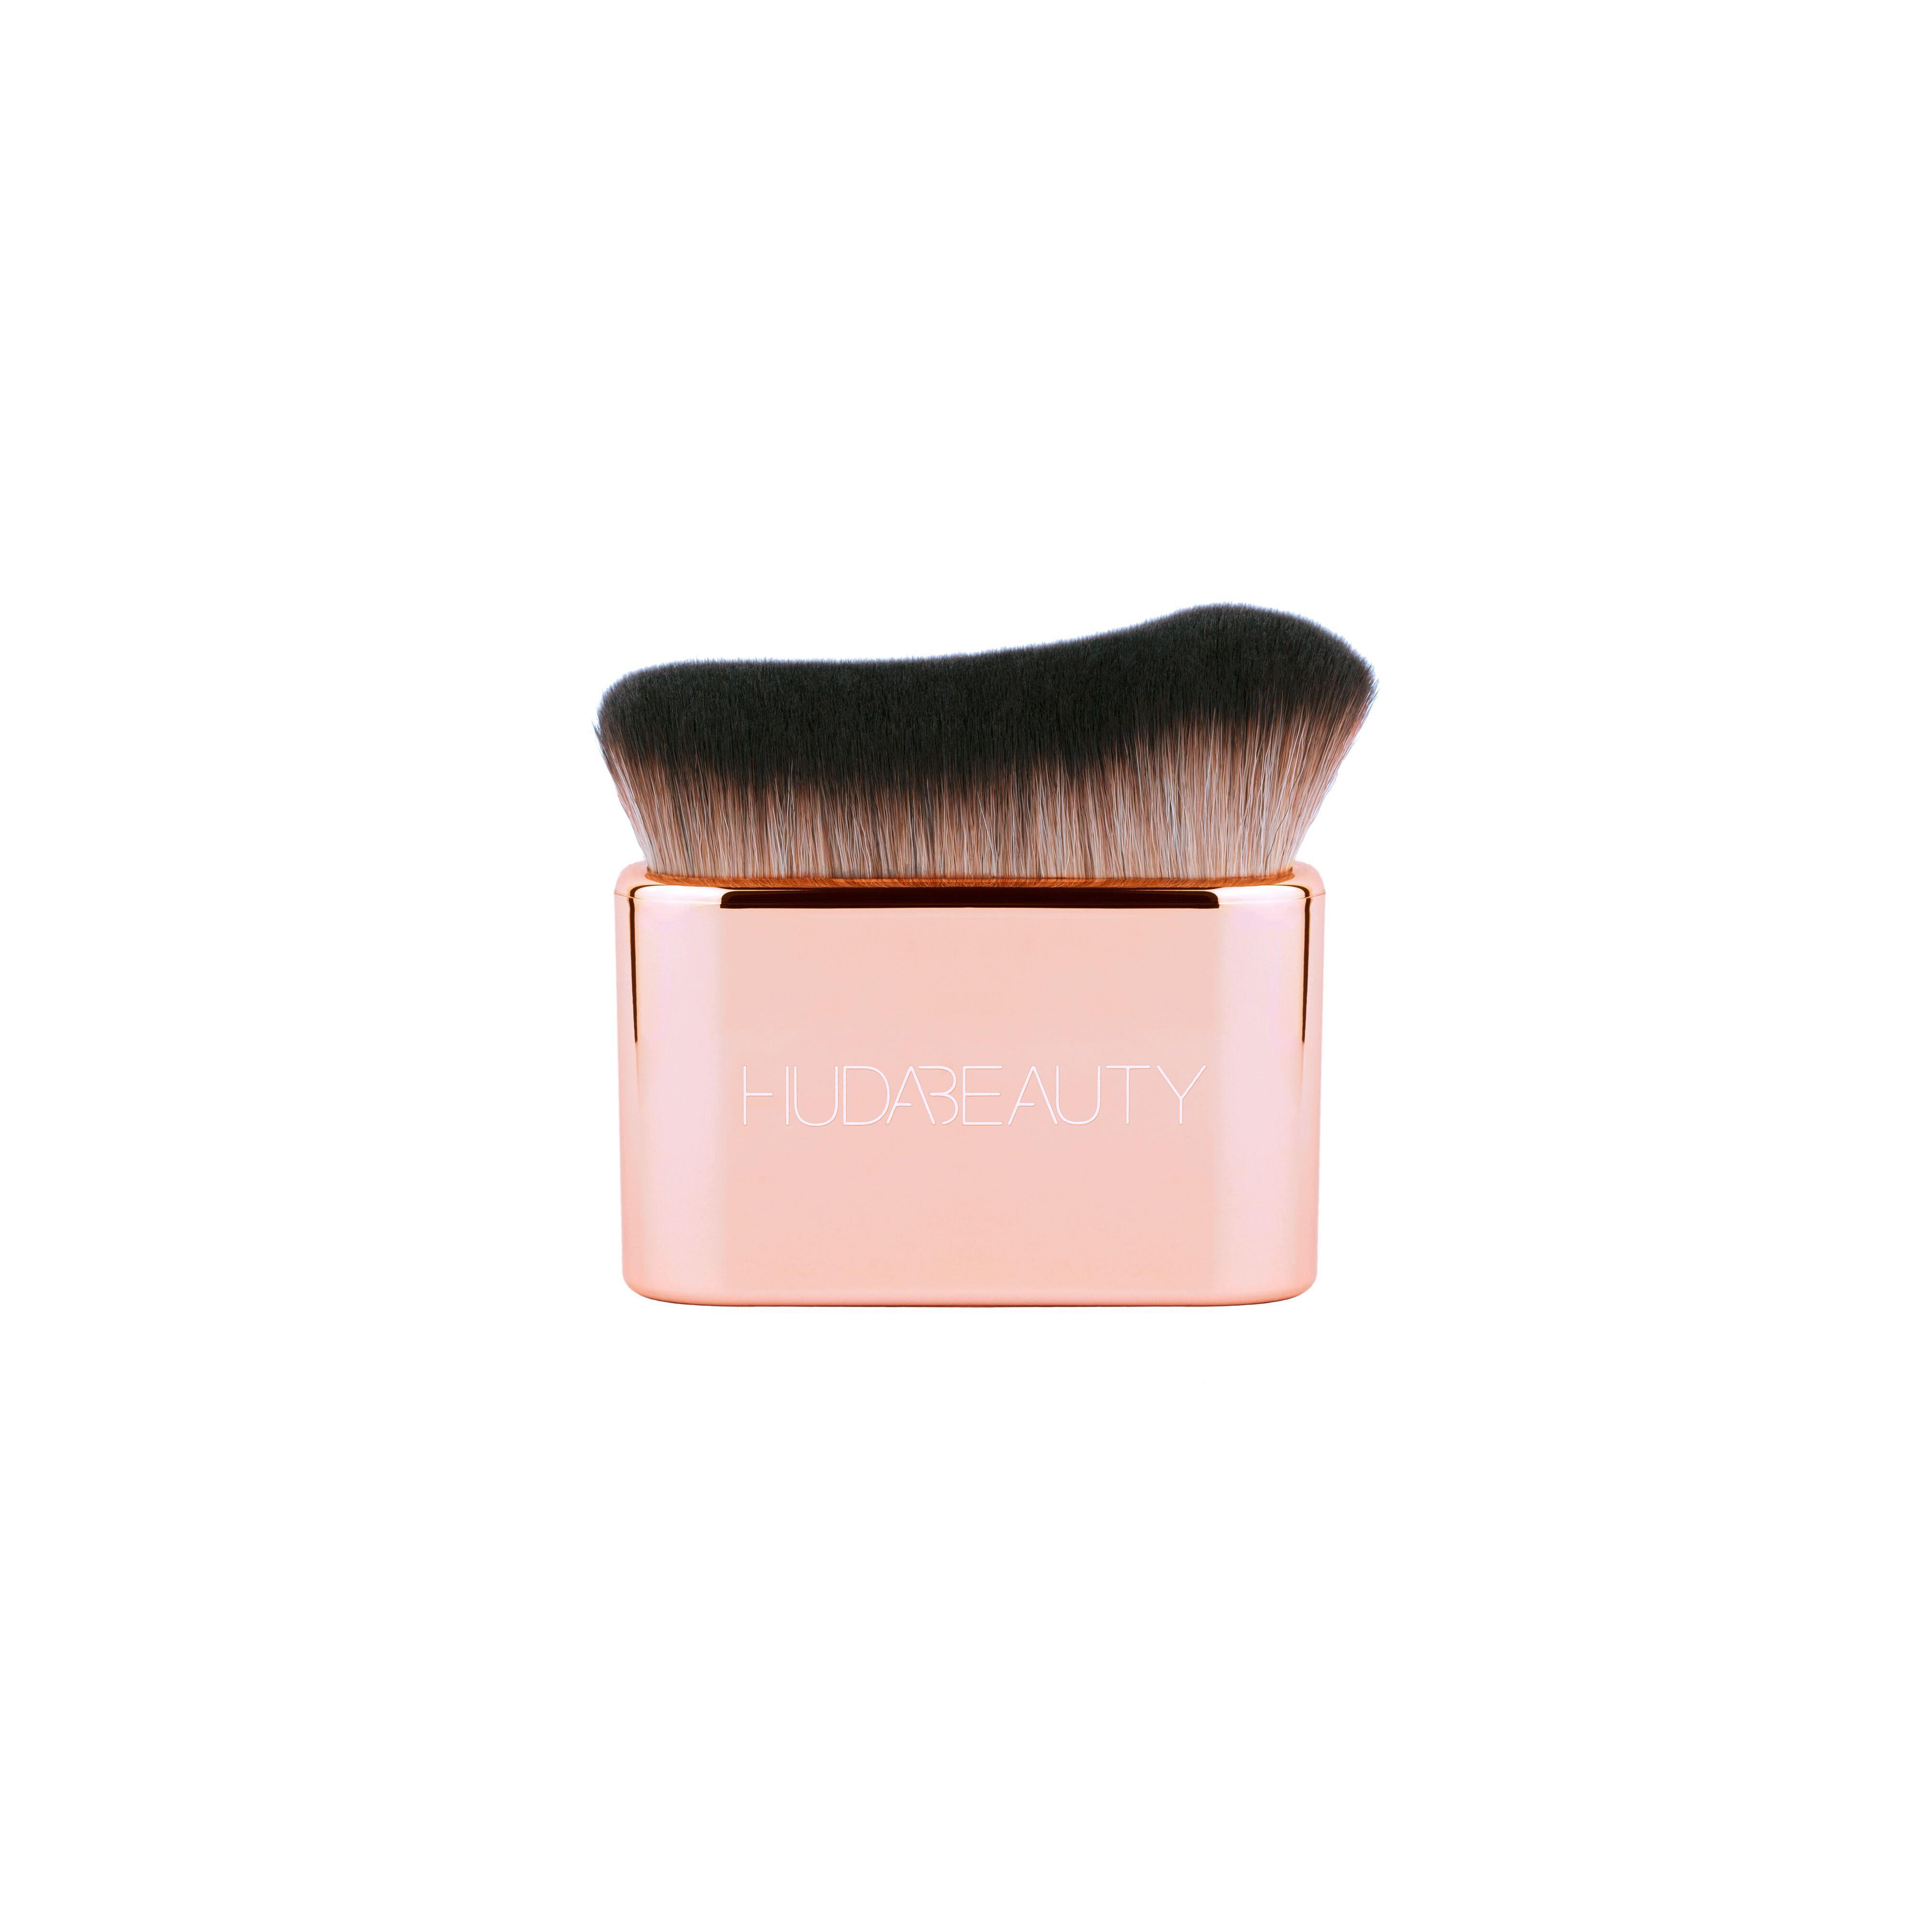 Huda Beauty Blur & Glow Body Brush - Shop Now